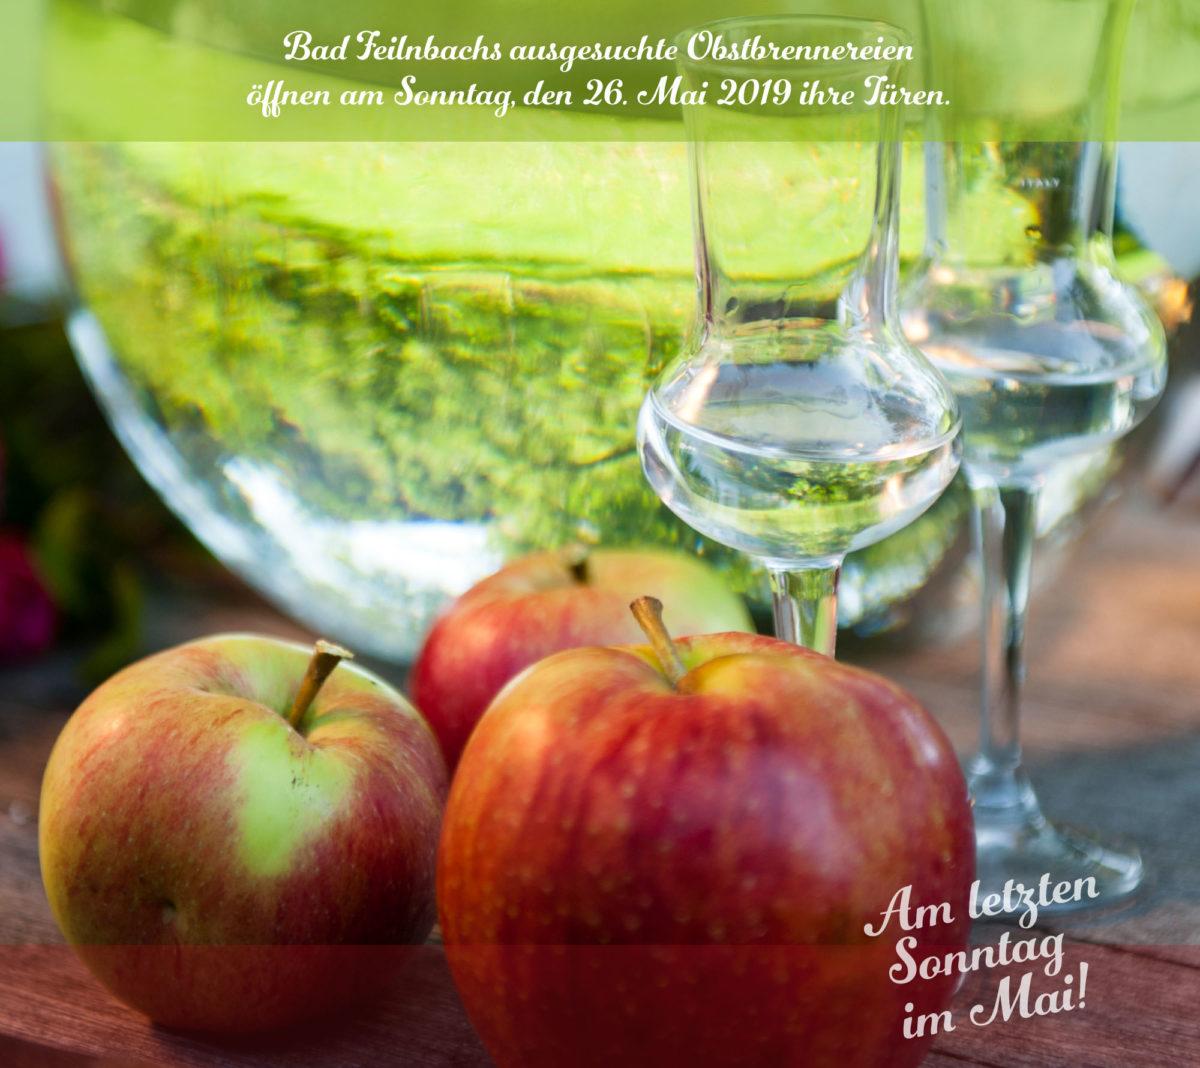 https://www.ktv-badfeilnbach.de/wp-content/uploads/2018/07/KT_Brenner_Key-Visual-2019-HL-ausgesuchte-Brennereien-1200x1068.jpg